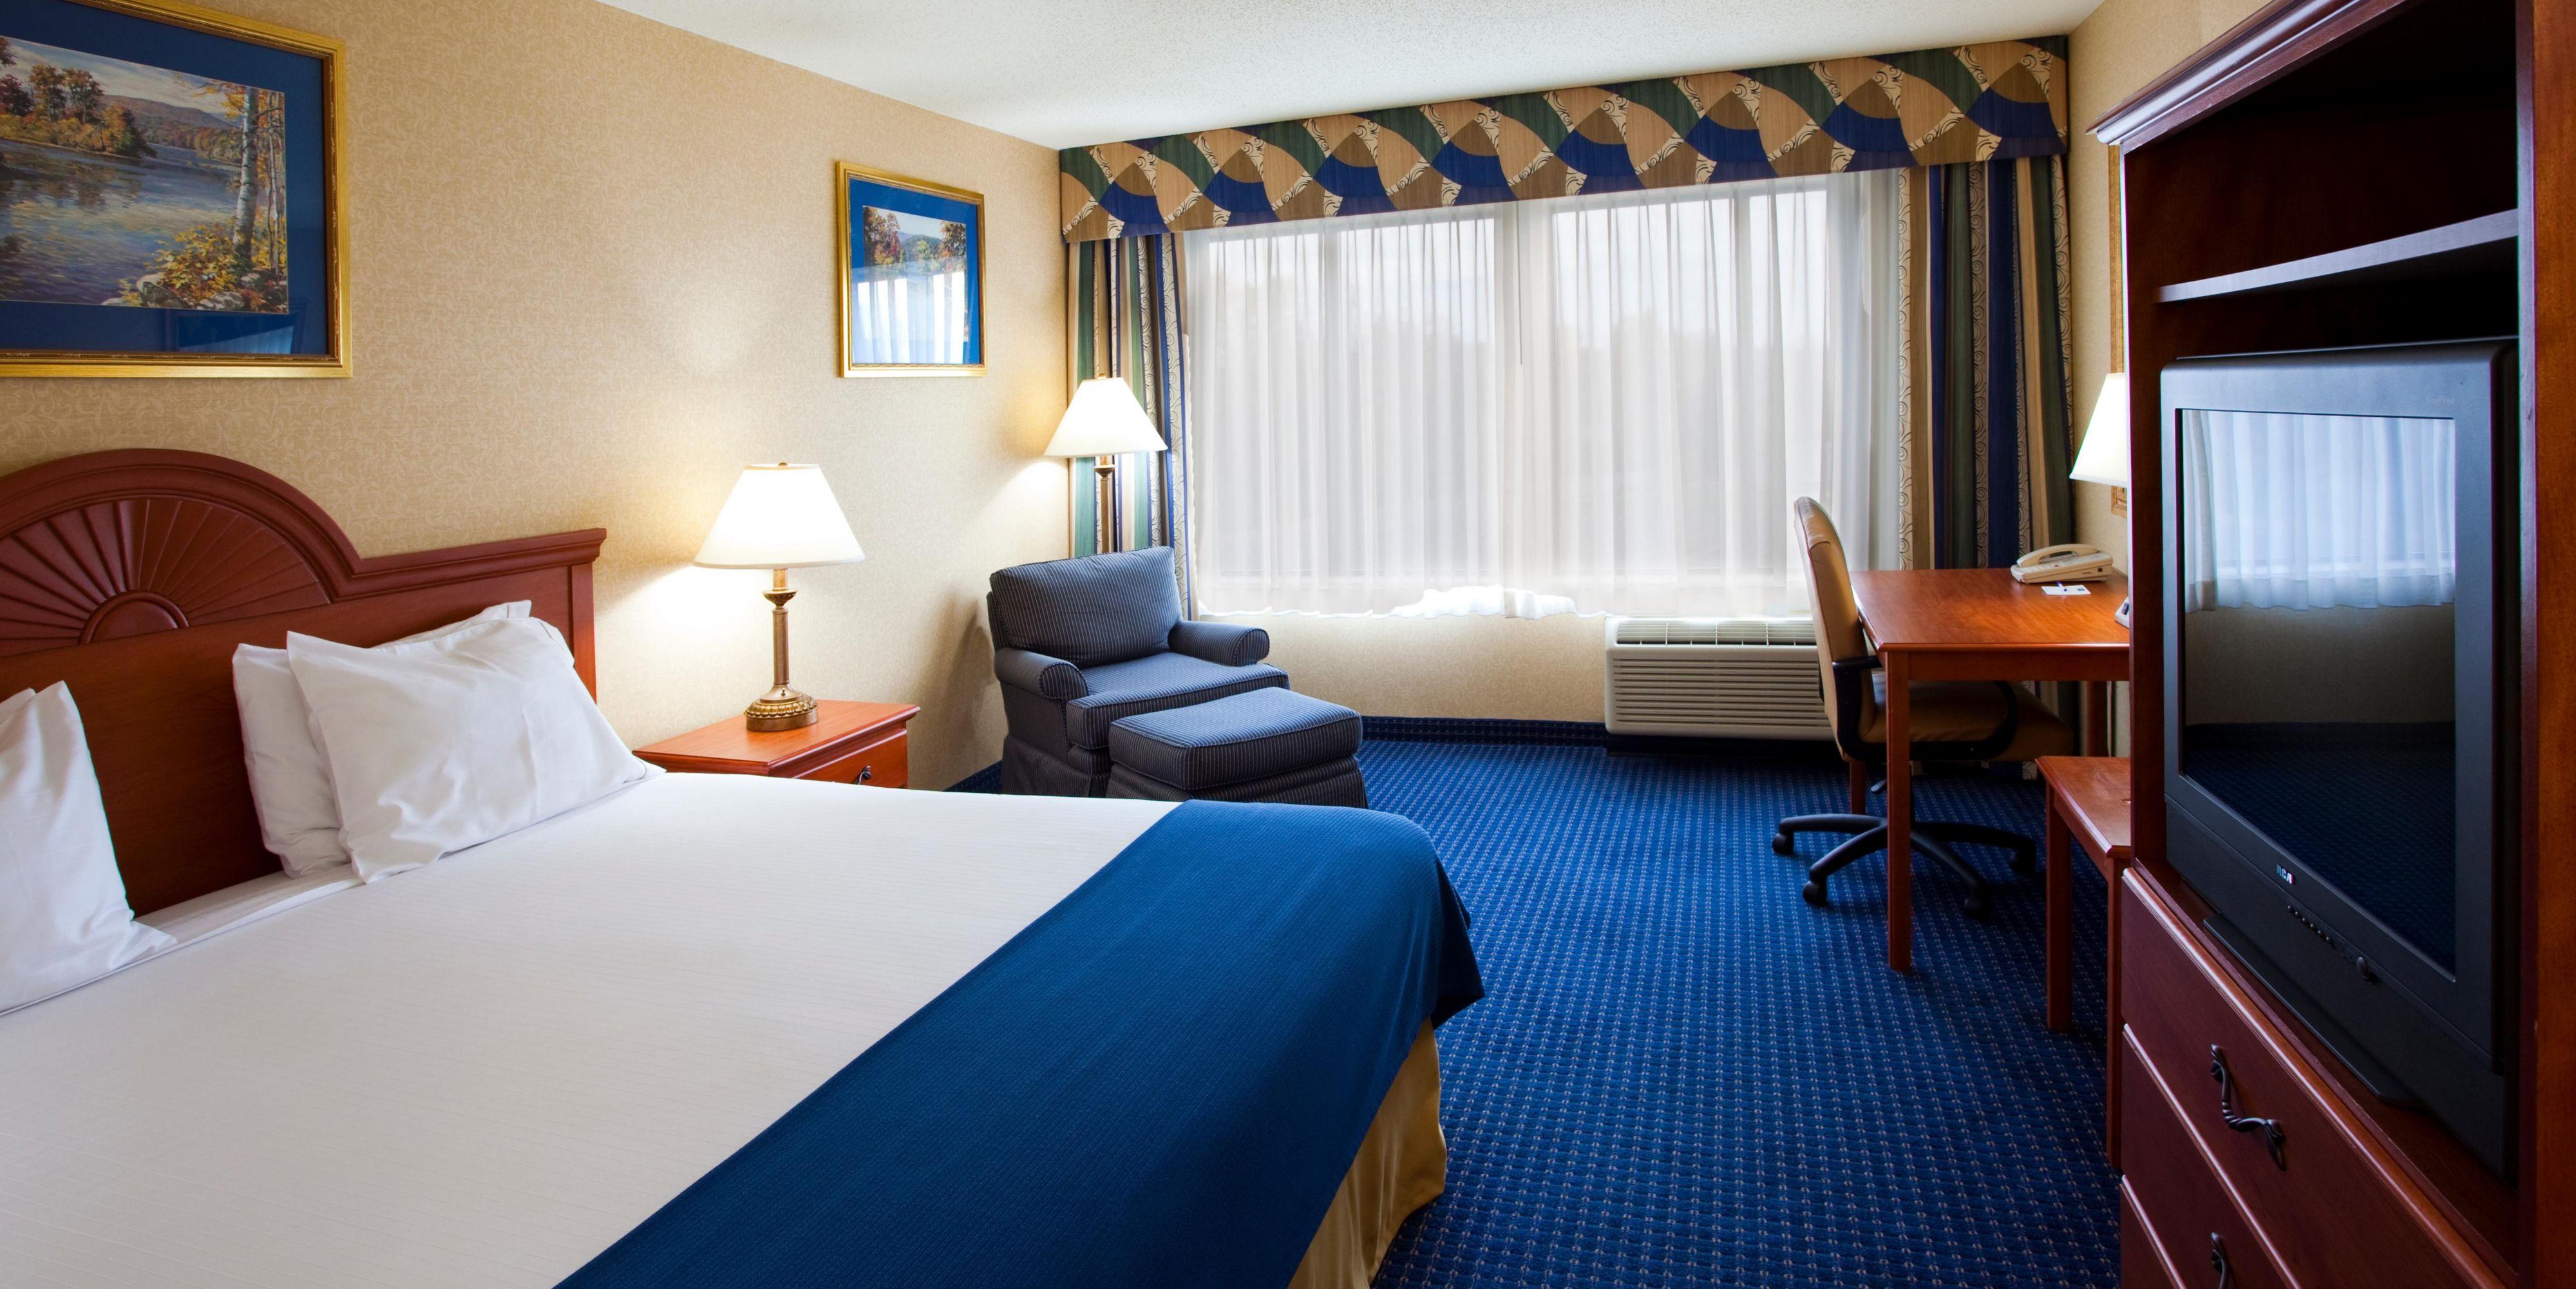 Holiday Inn Express North Syracuse 2532048346 2x1